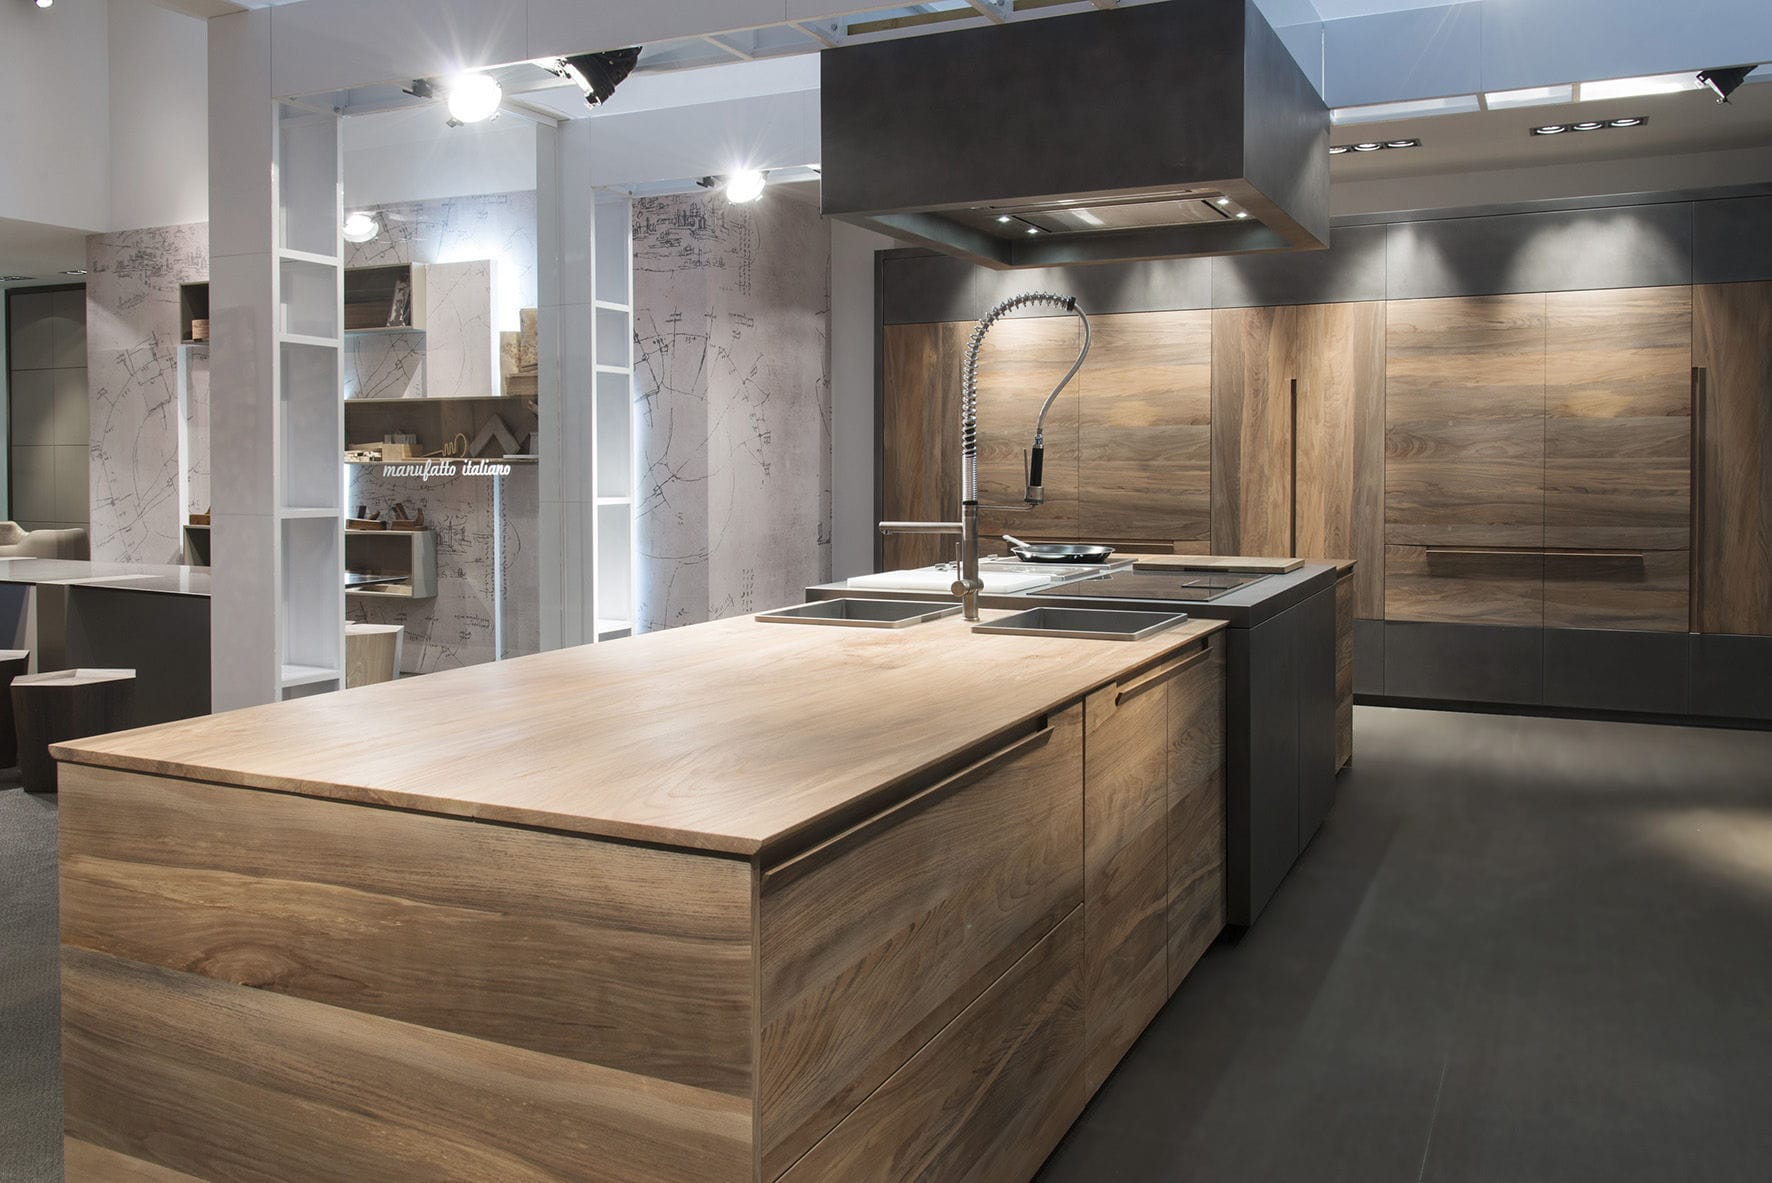 Cucina moderna / in faggio / in acciaio / con isola ...